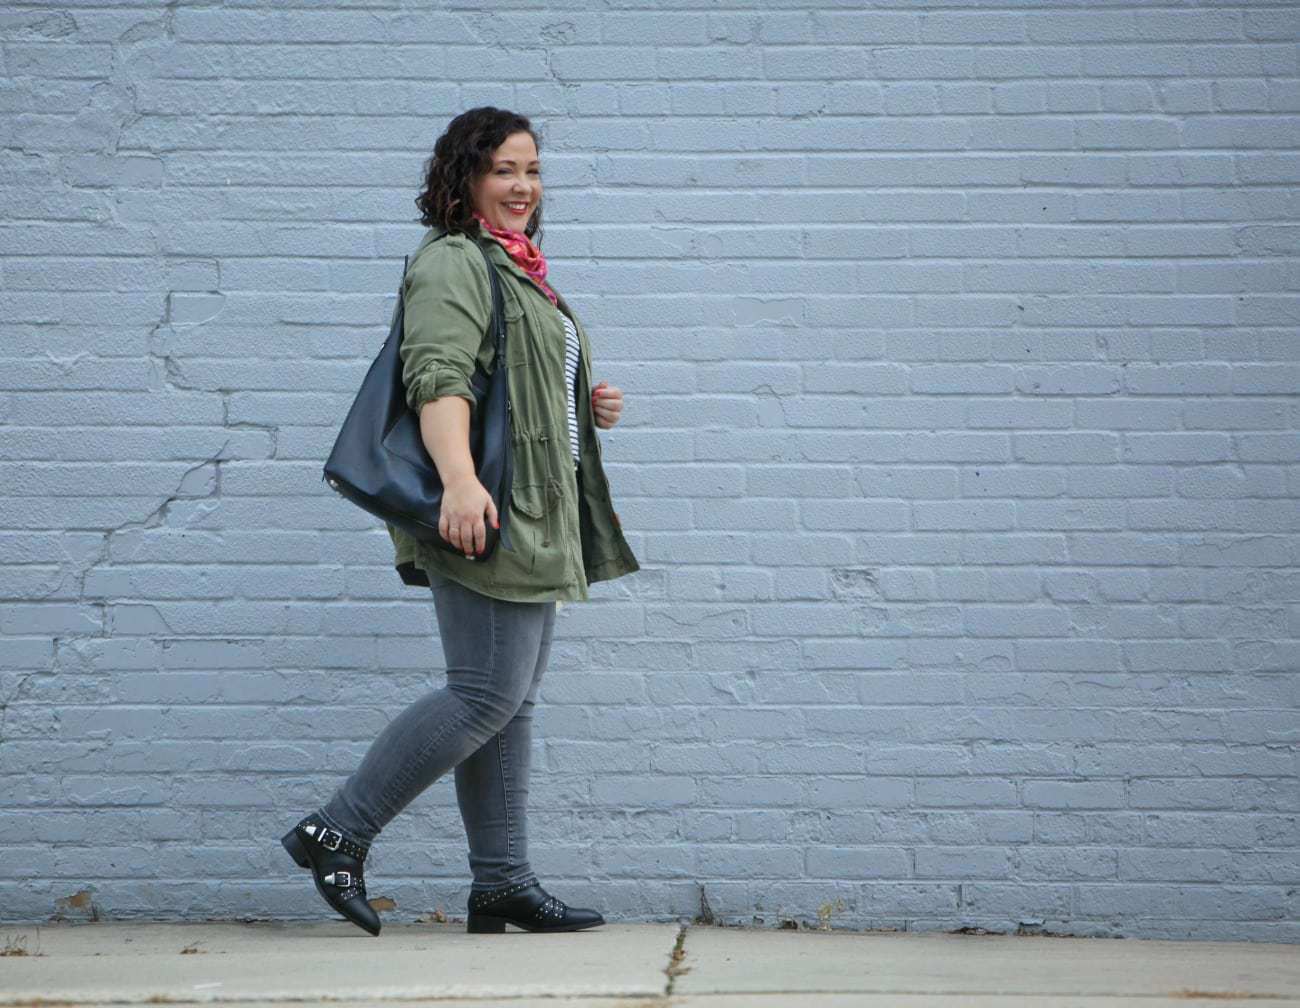 wardrobe oxygen over 40 fashion blog